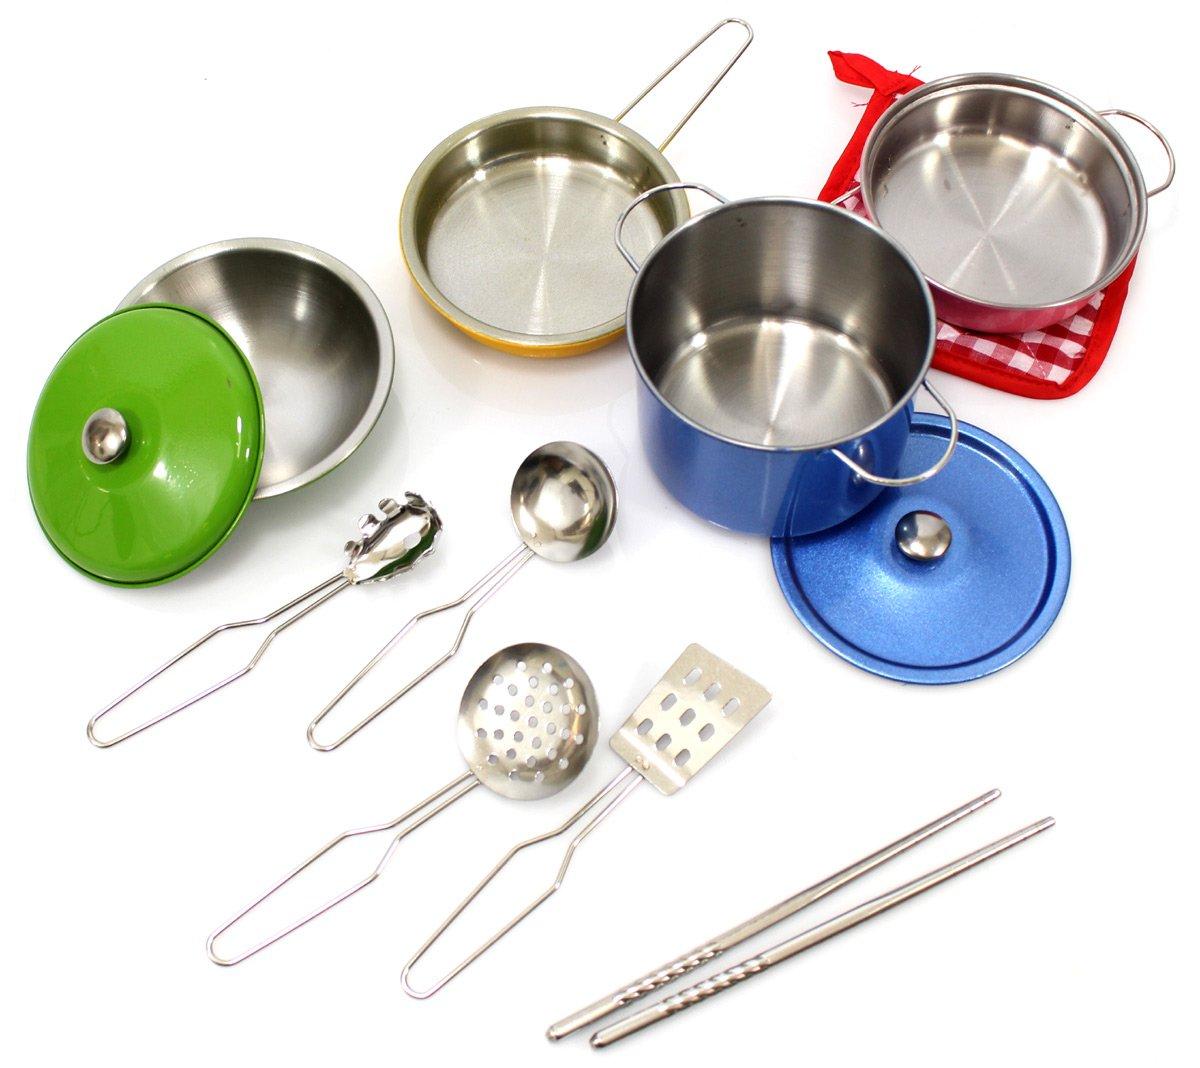 AMPERSAND SHOPS Kids Kitchen Cookware Metal Pots and Pans Playset (12-Piece Set)